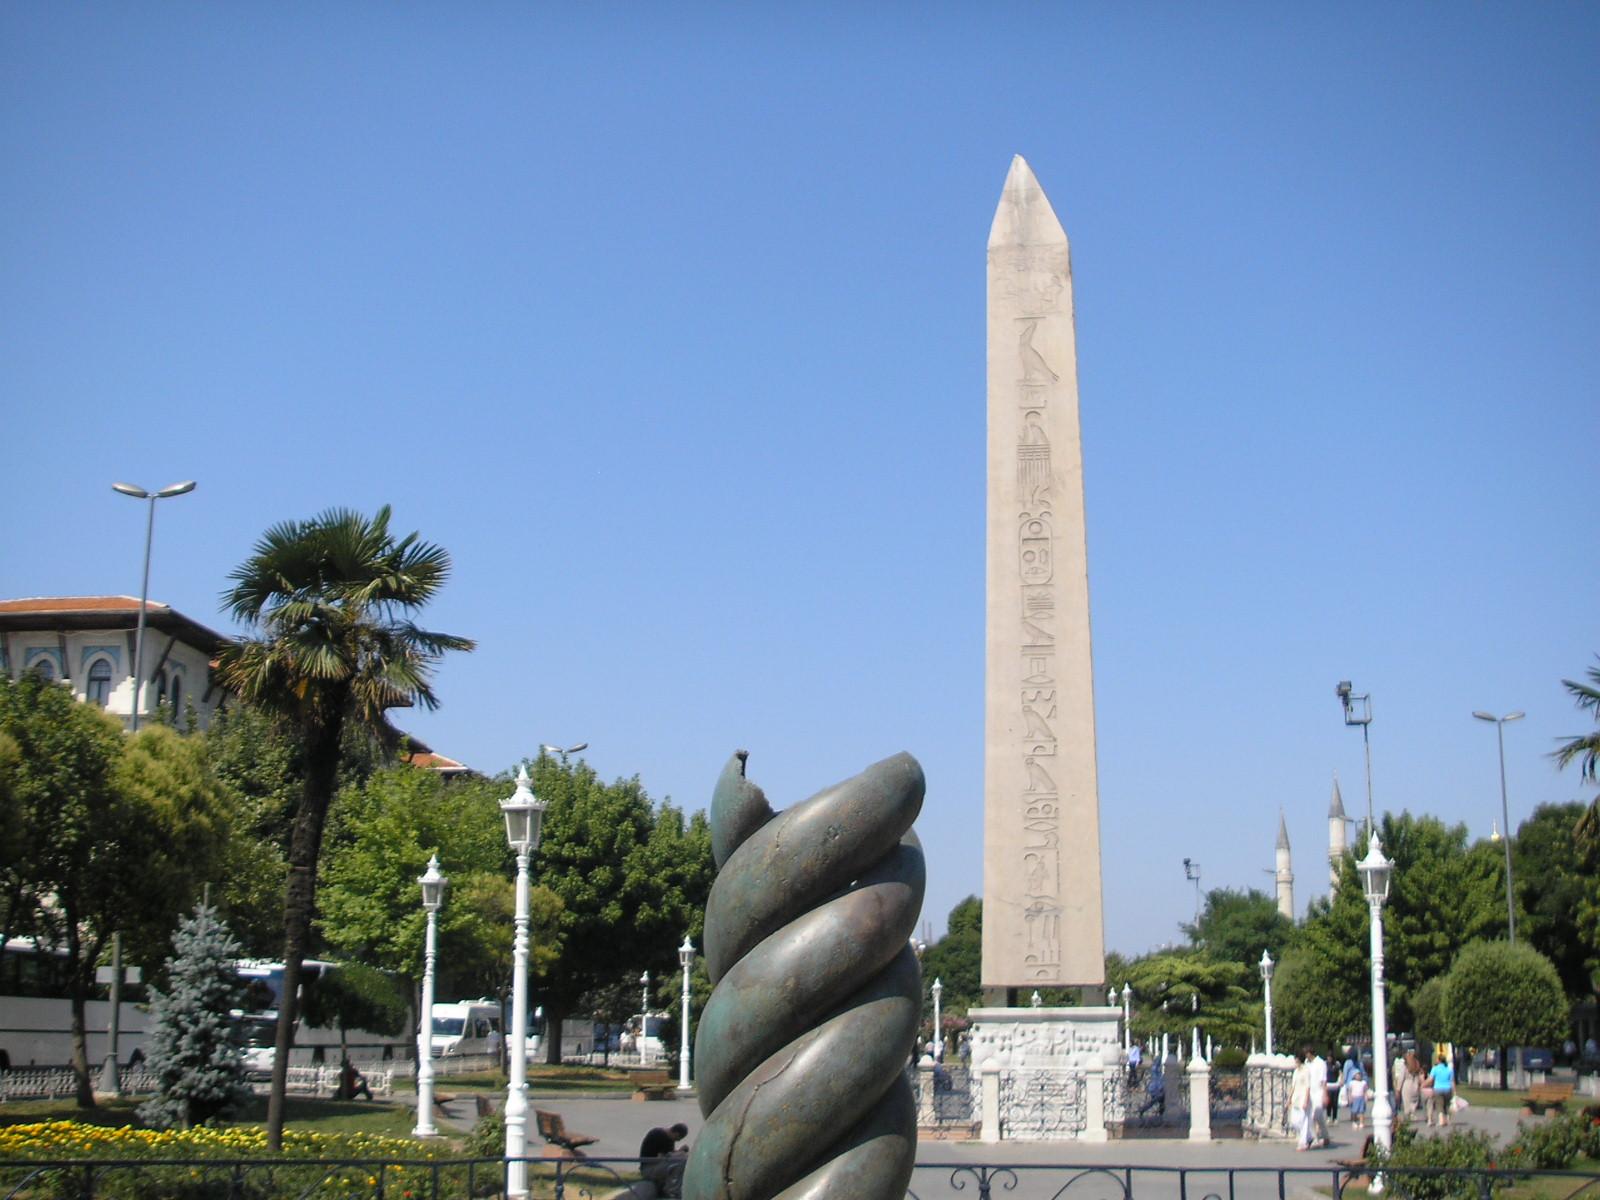 File:Snake column Hippodrome Constantinople 2007 004.jpg - Wikimedia Commons